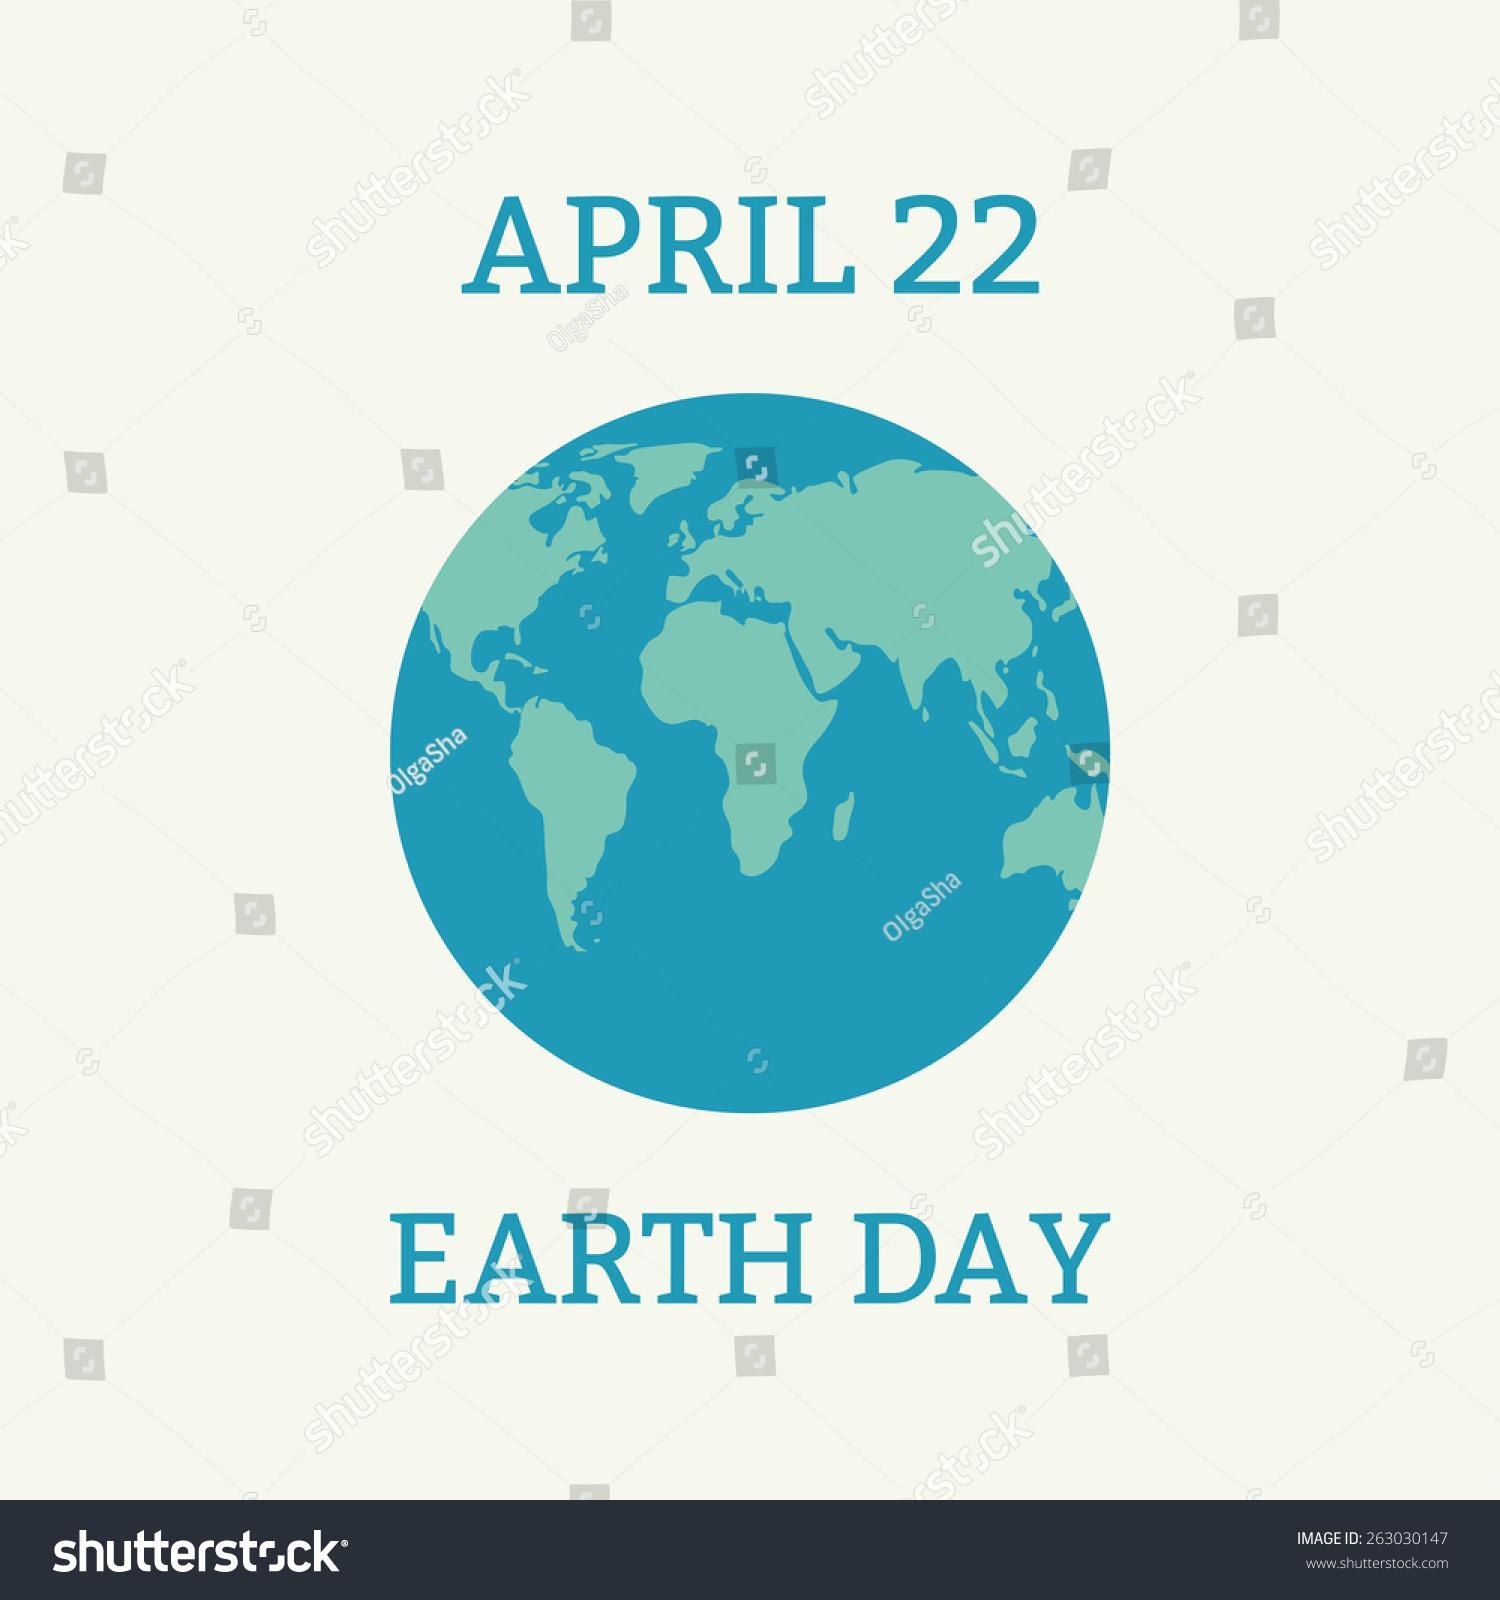 Earth Day Symbols Theholidayspotcom Inducedfo